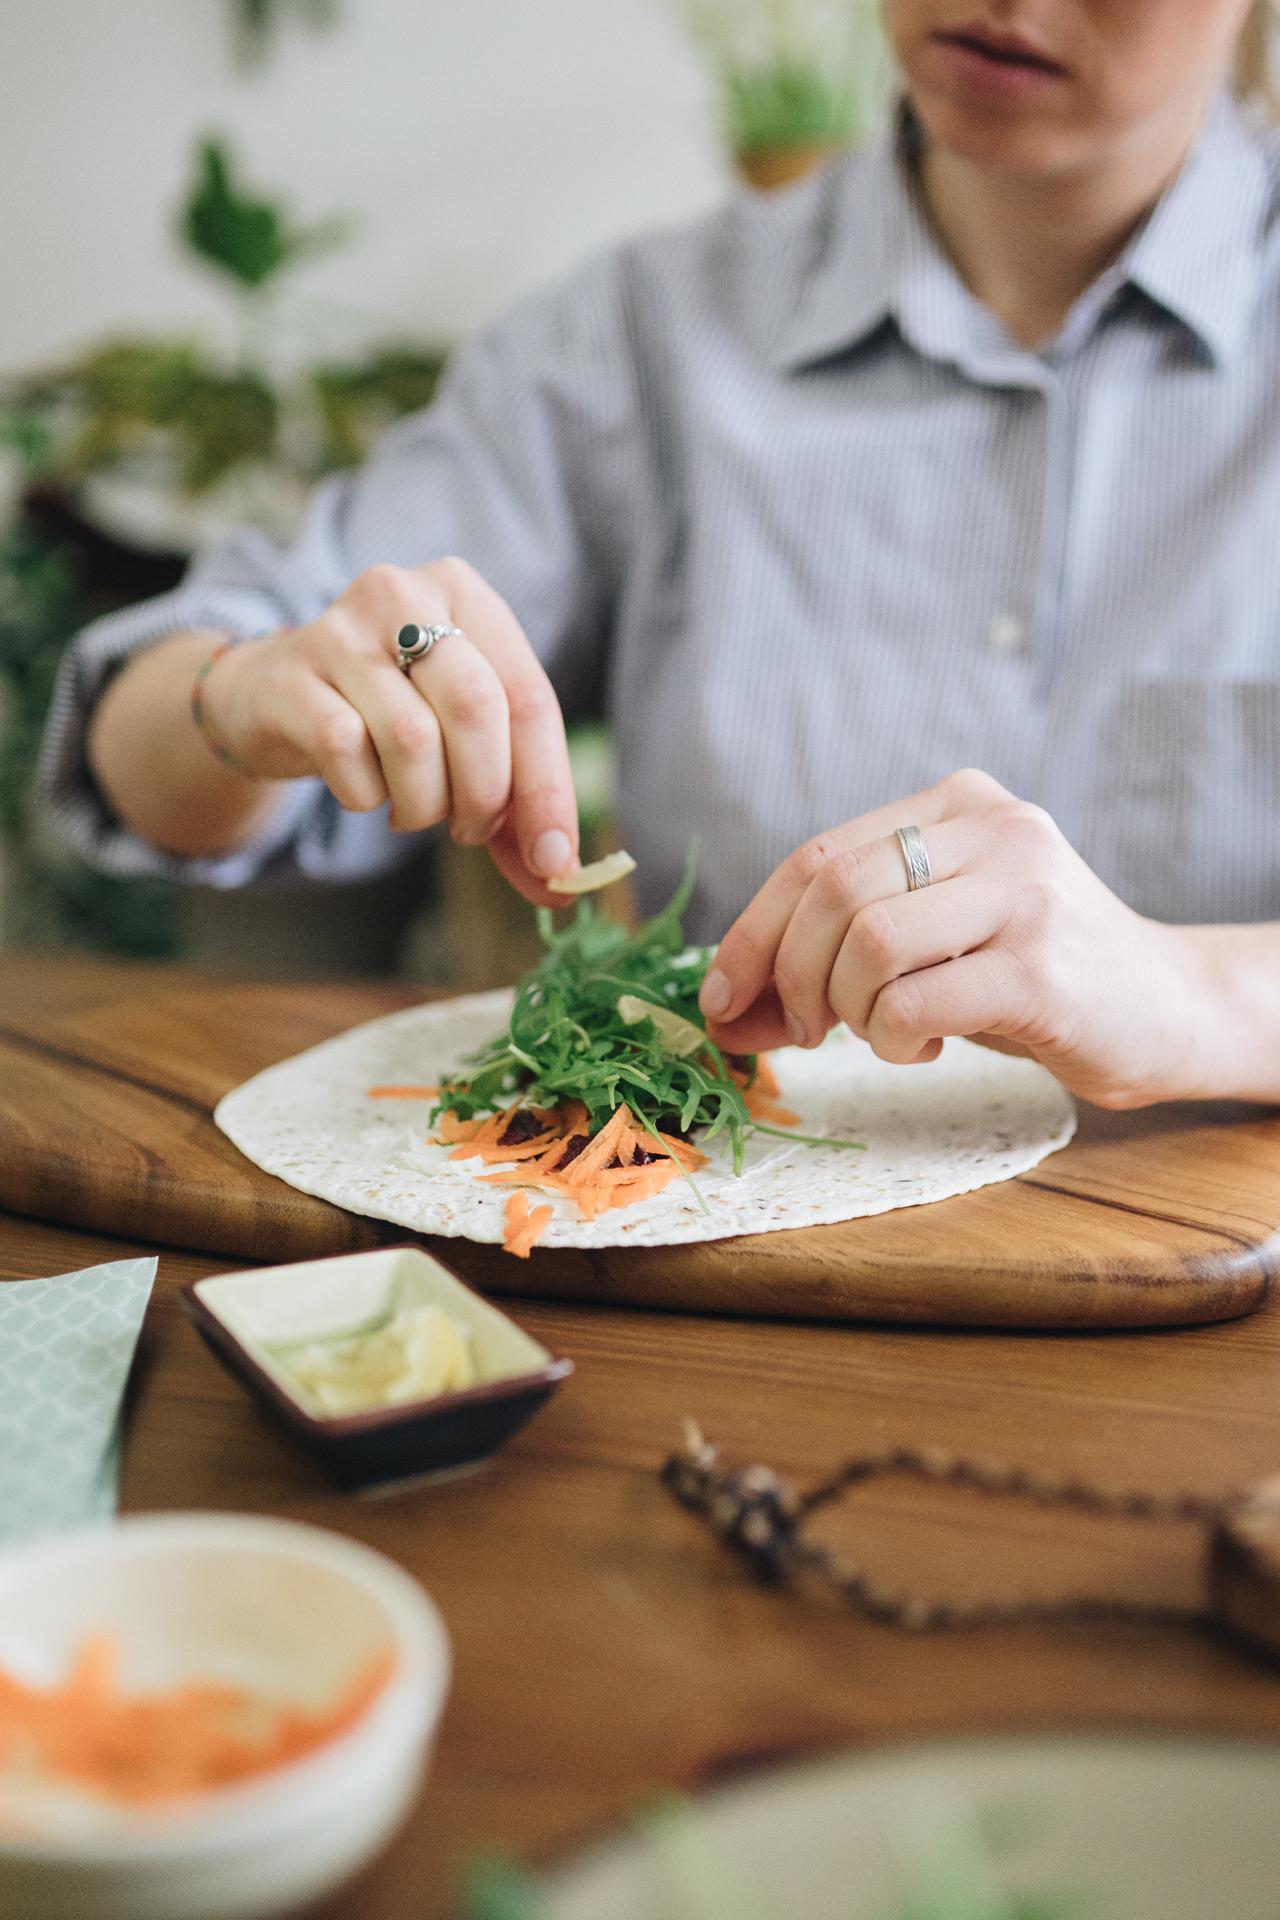 Frau füllt Tortilla Wrap mit Gemüse